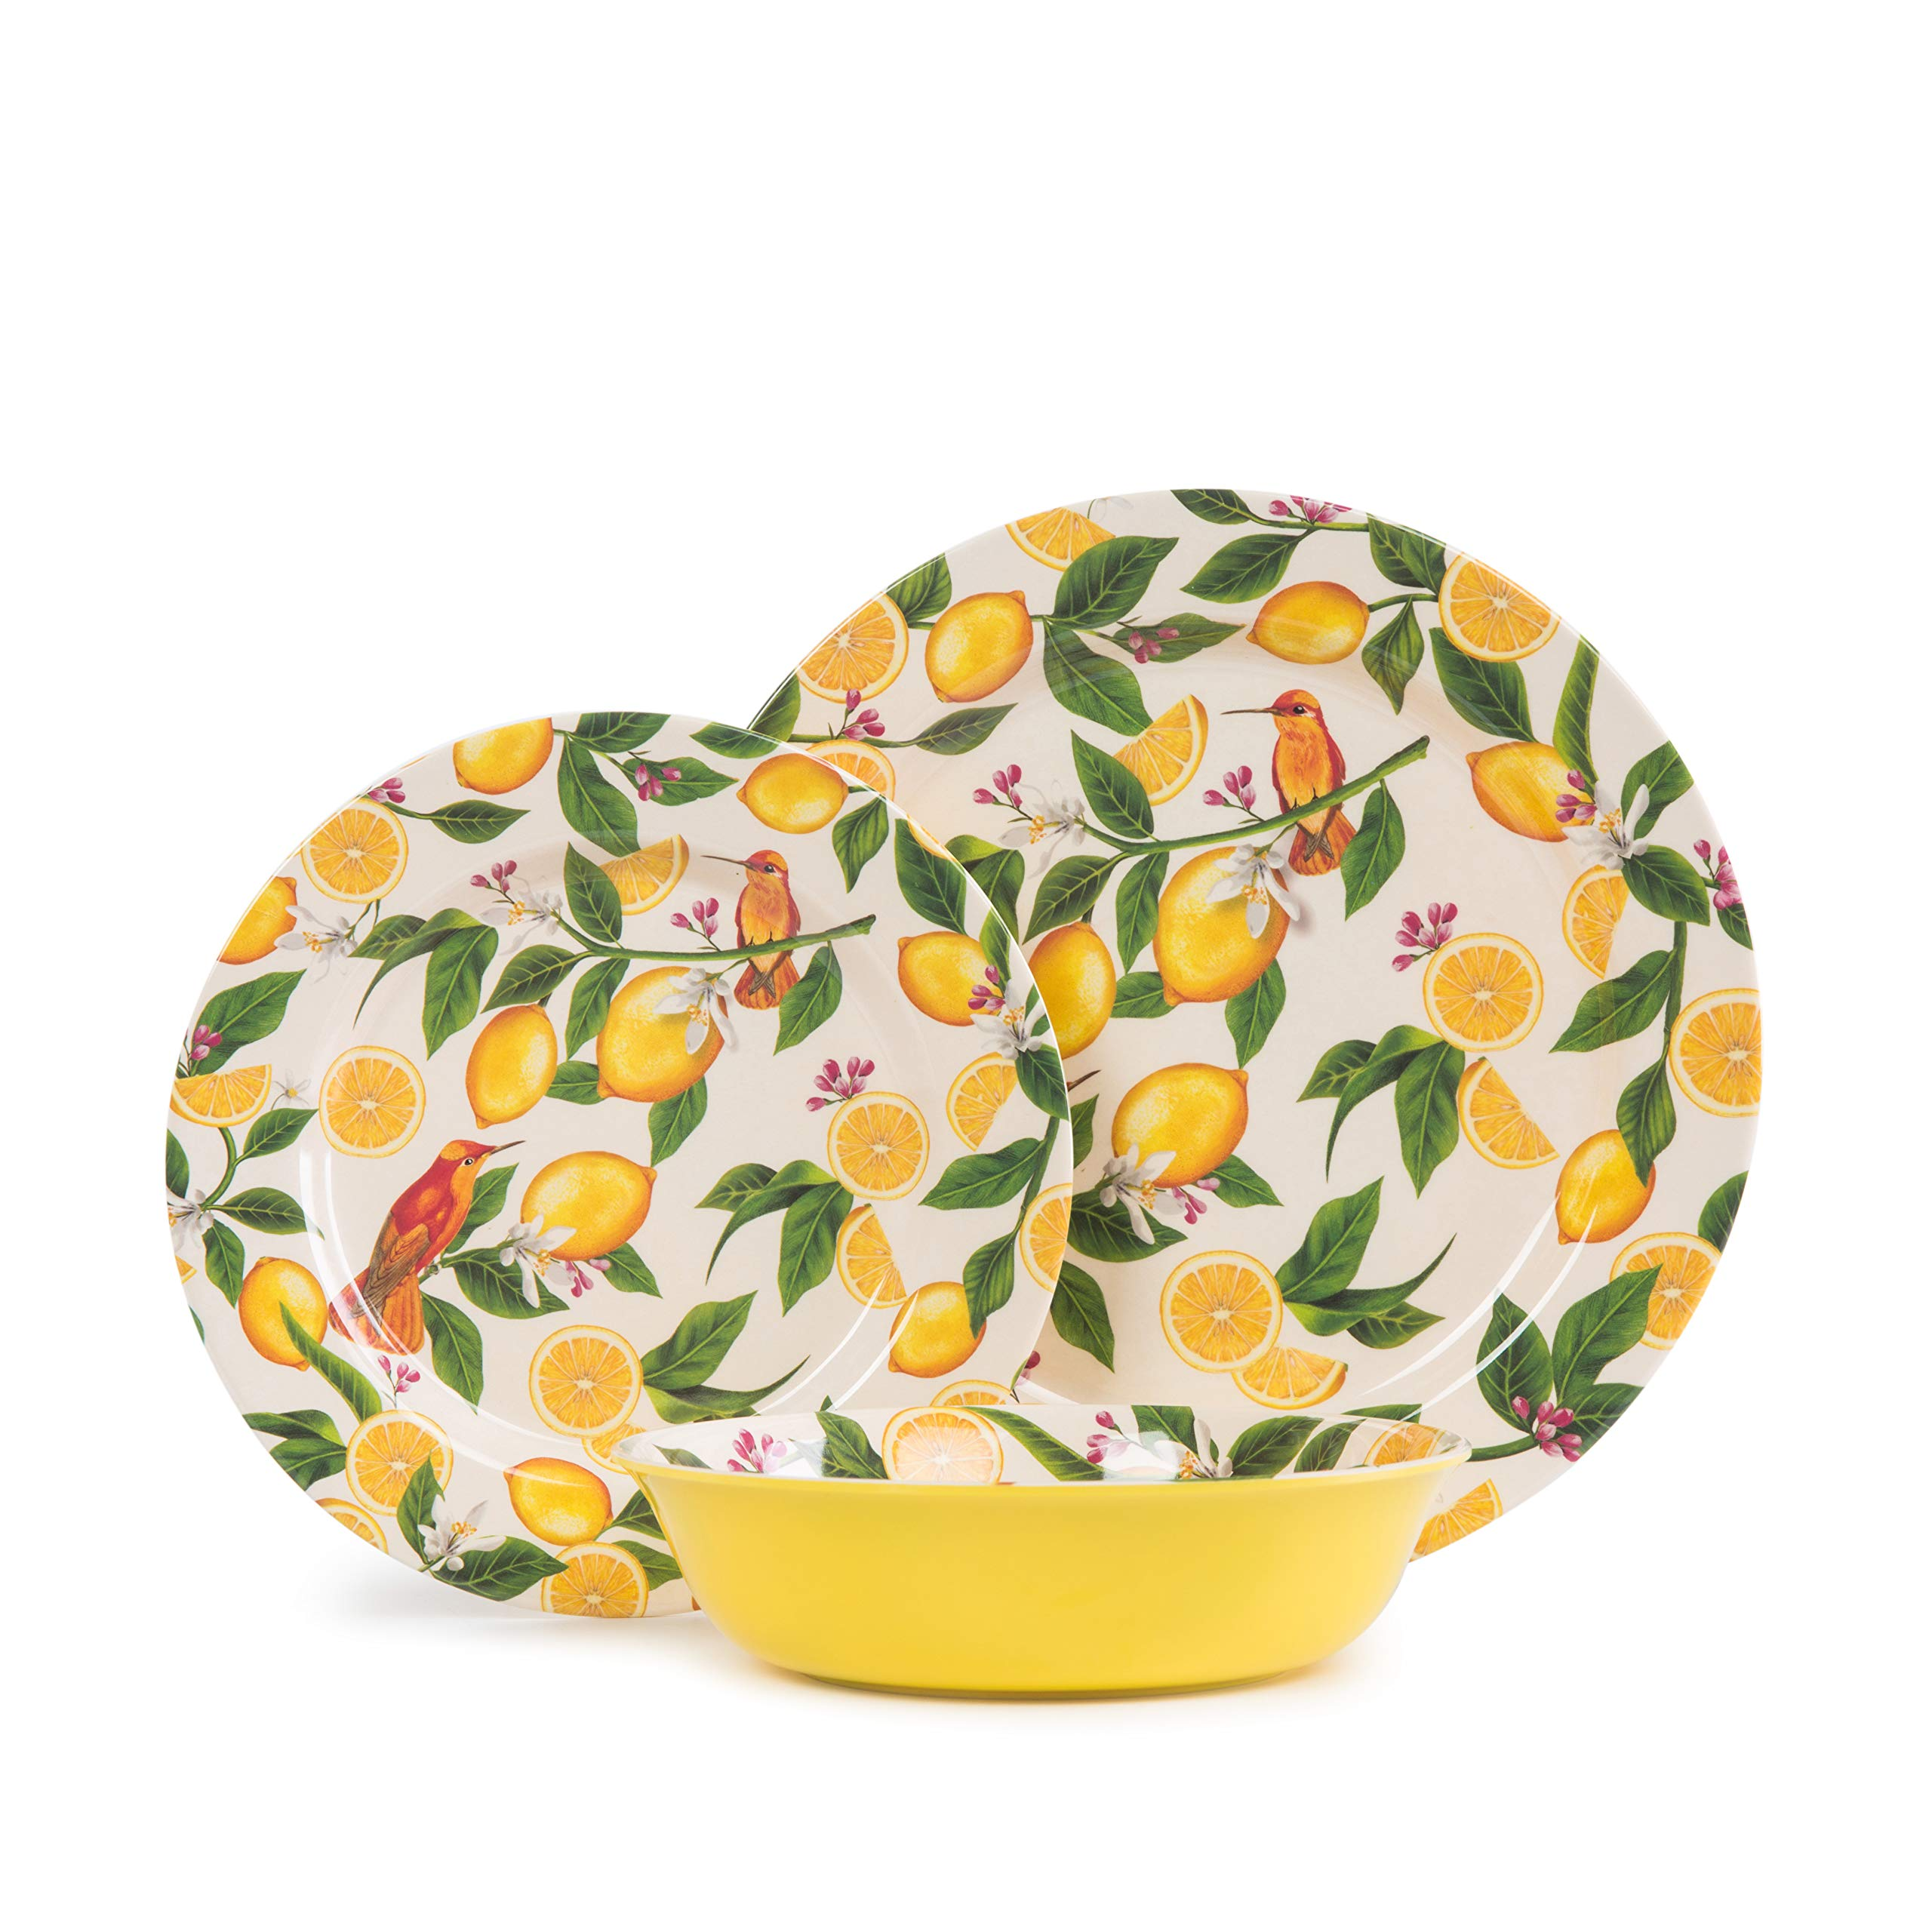 Lemon Dinnerware Set Multi Brylanehome 16-Pc